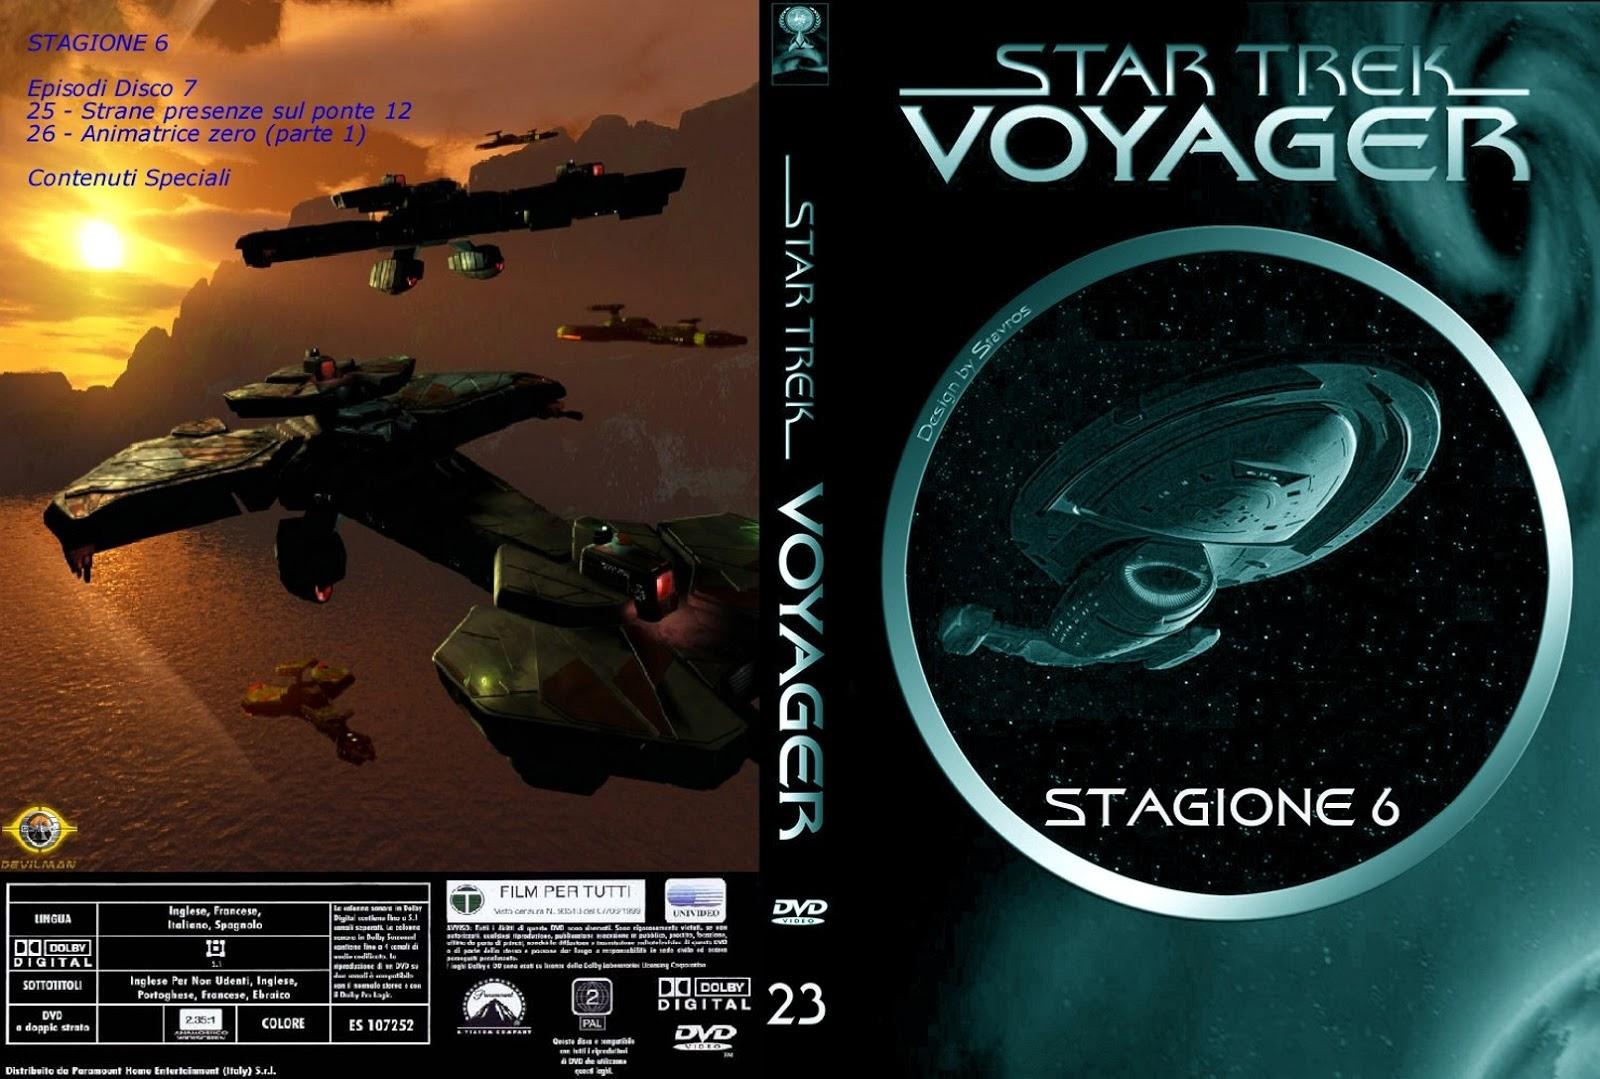 http://3.bp.blogspot.com/-x2abqH3QXH4/UJwKuDSm0cI/AAAAAAAAG5M/Kbt9wxiItus/s1600/Star+Trek+Voyager+6%C2%B0+Stagione+(2003-2004).jpg